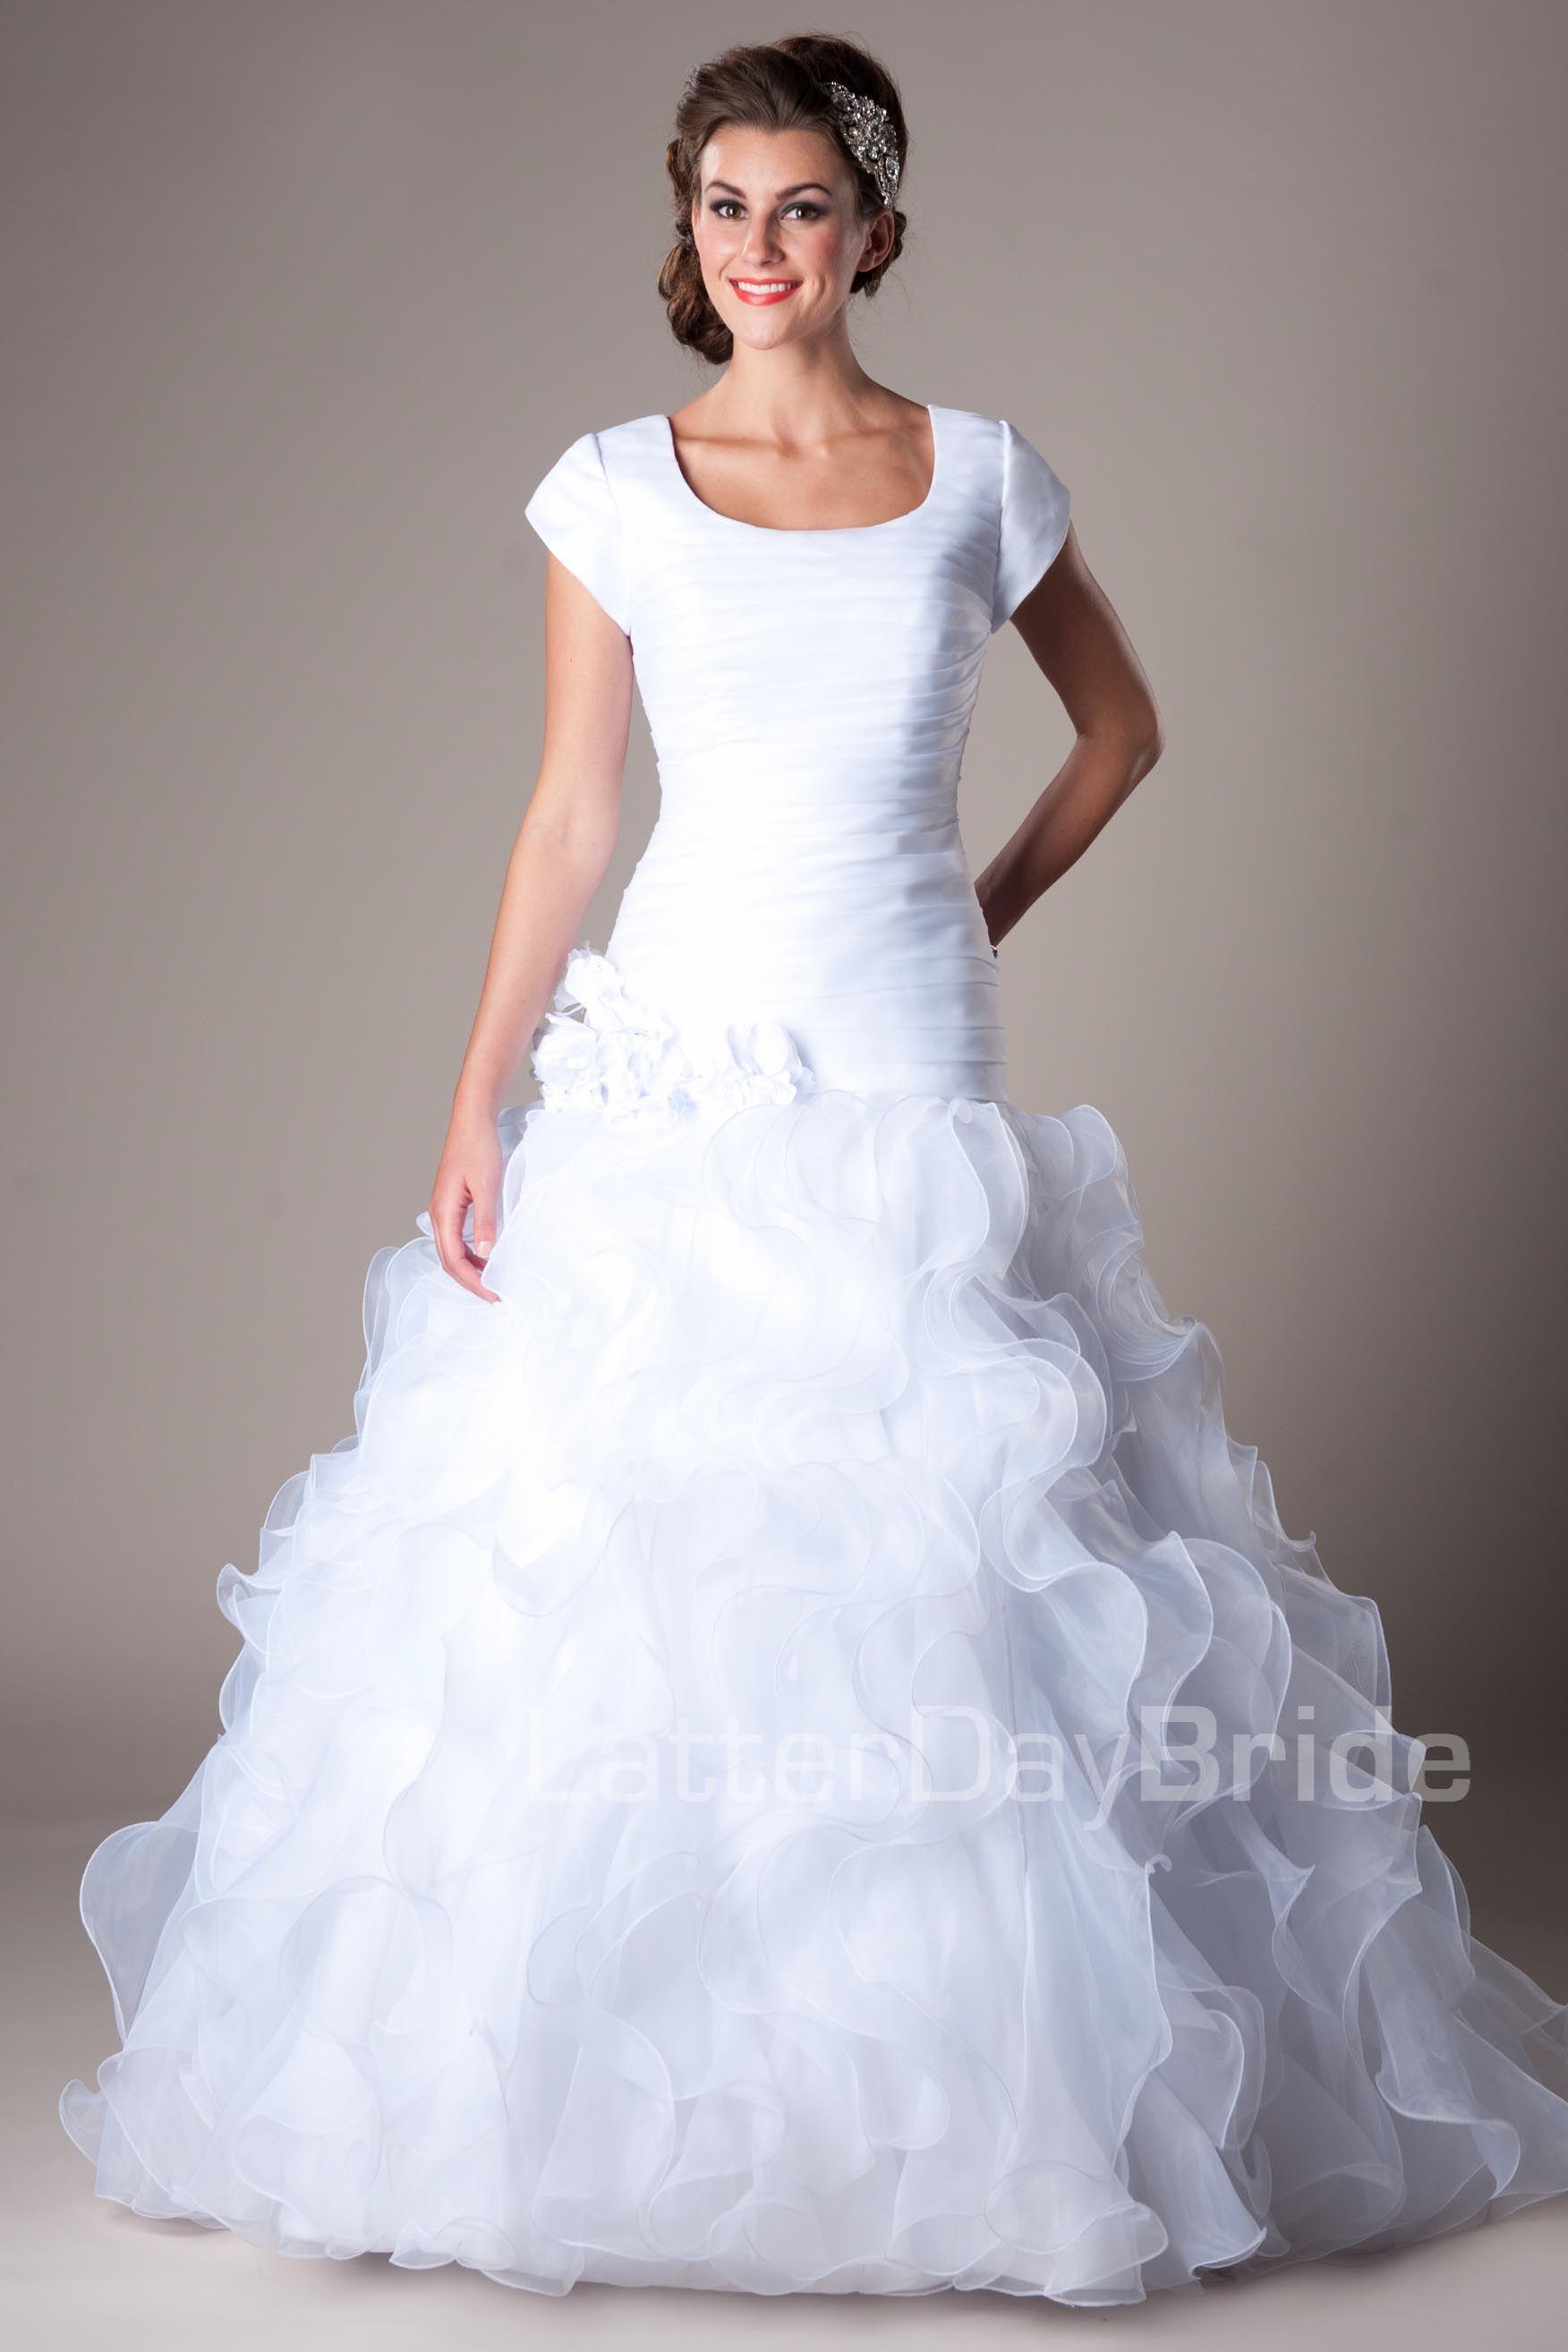 Modest Wedding Dresses : Volante One of my favourites